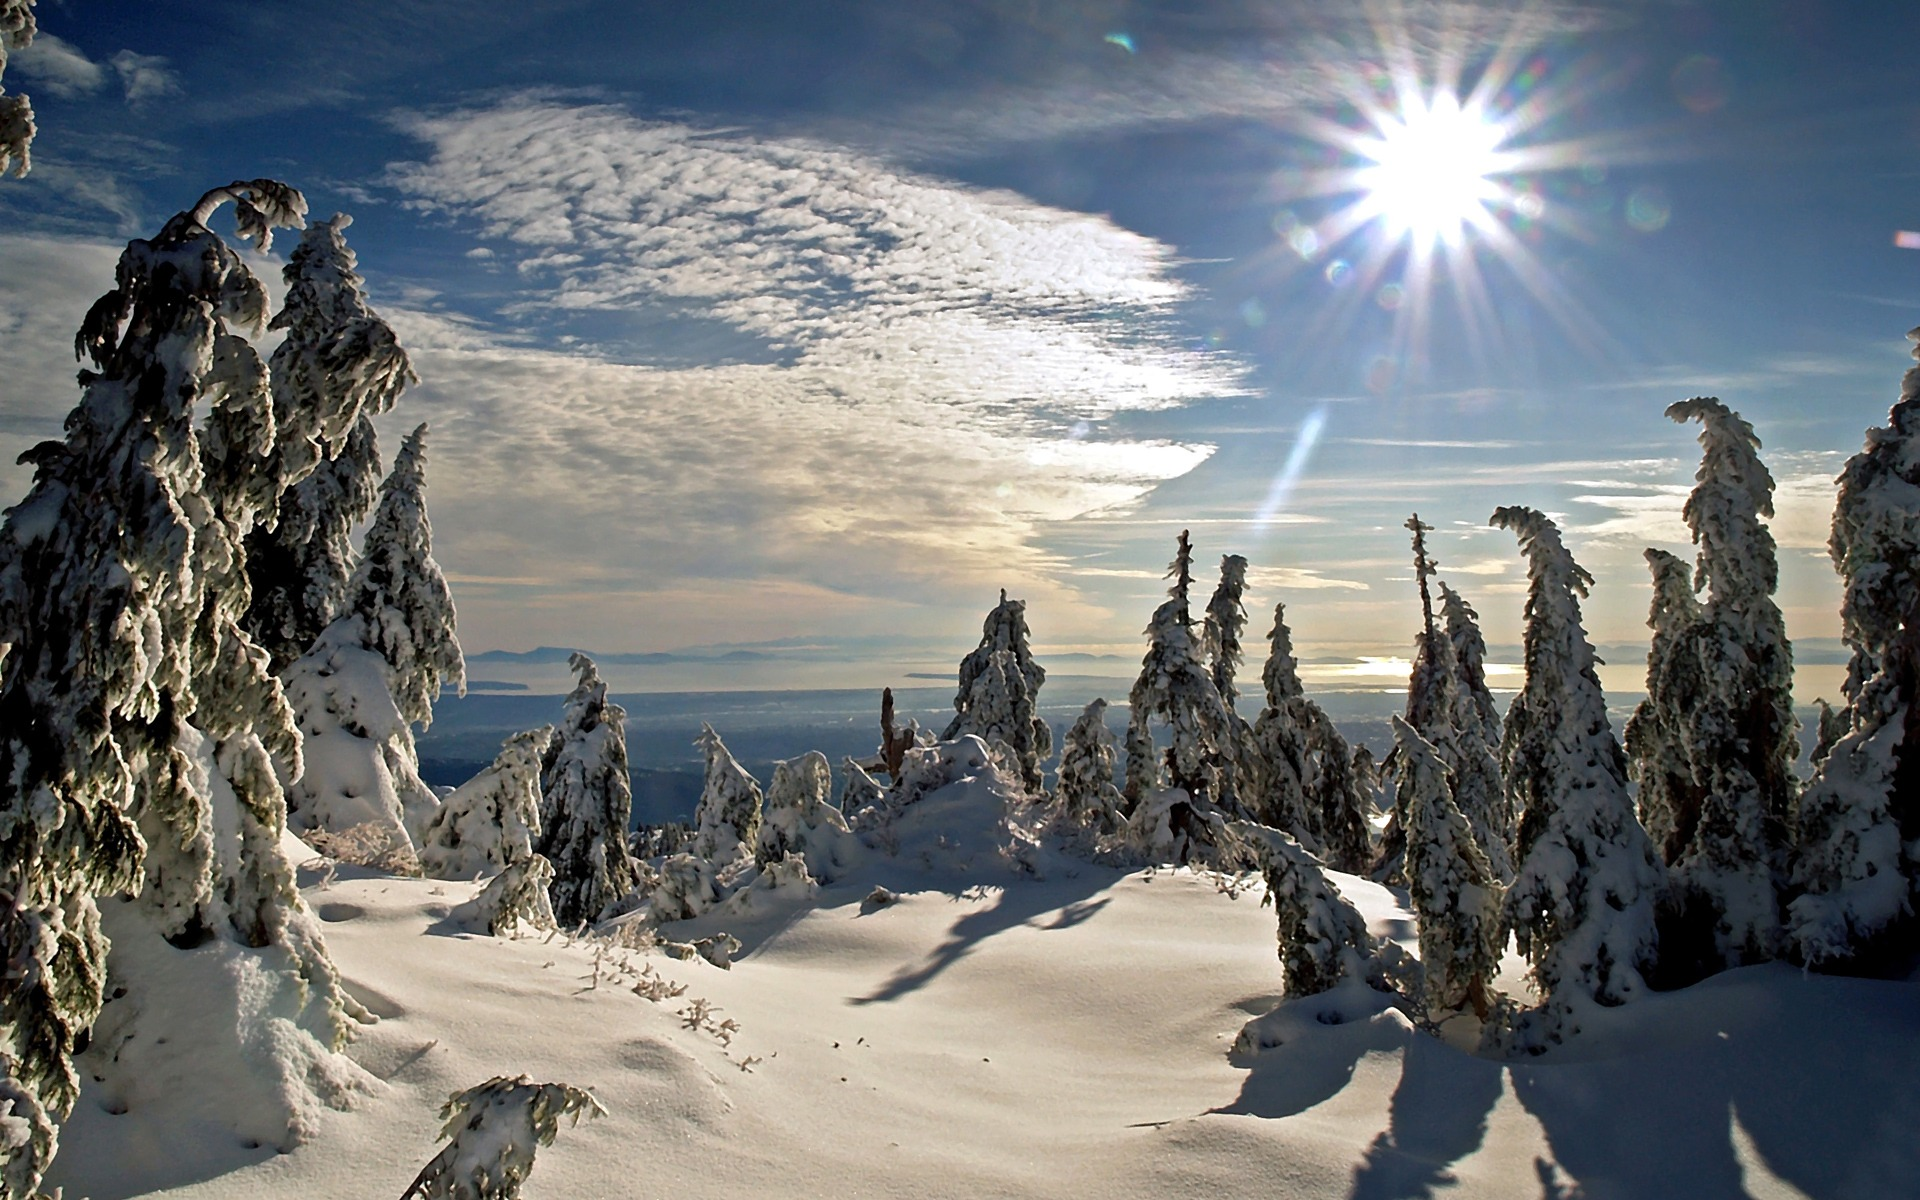 Winter Sun Wallpaper Winter Nature Wallpapers in jpg format for 1920x1200